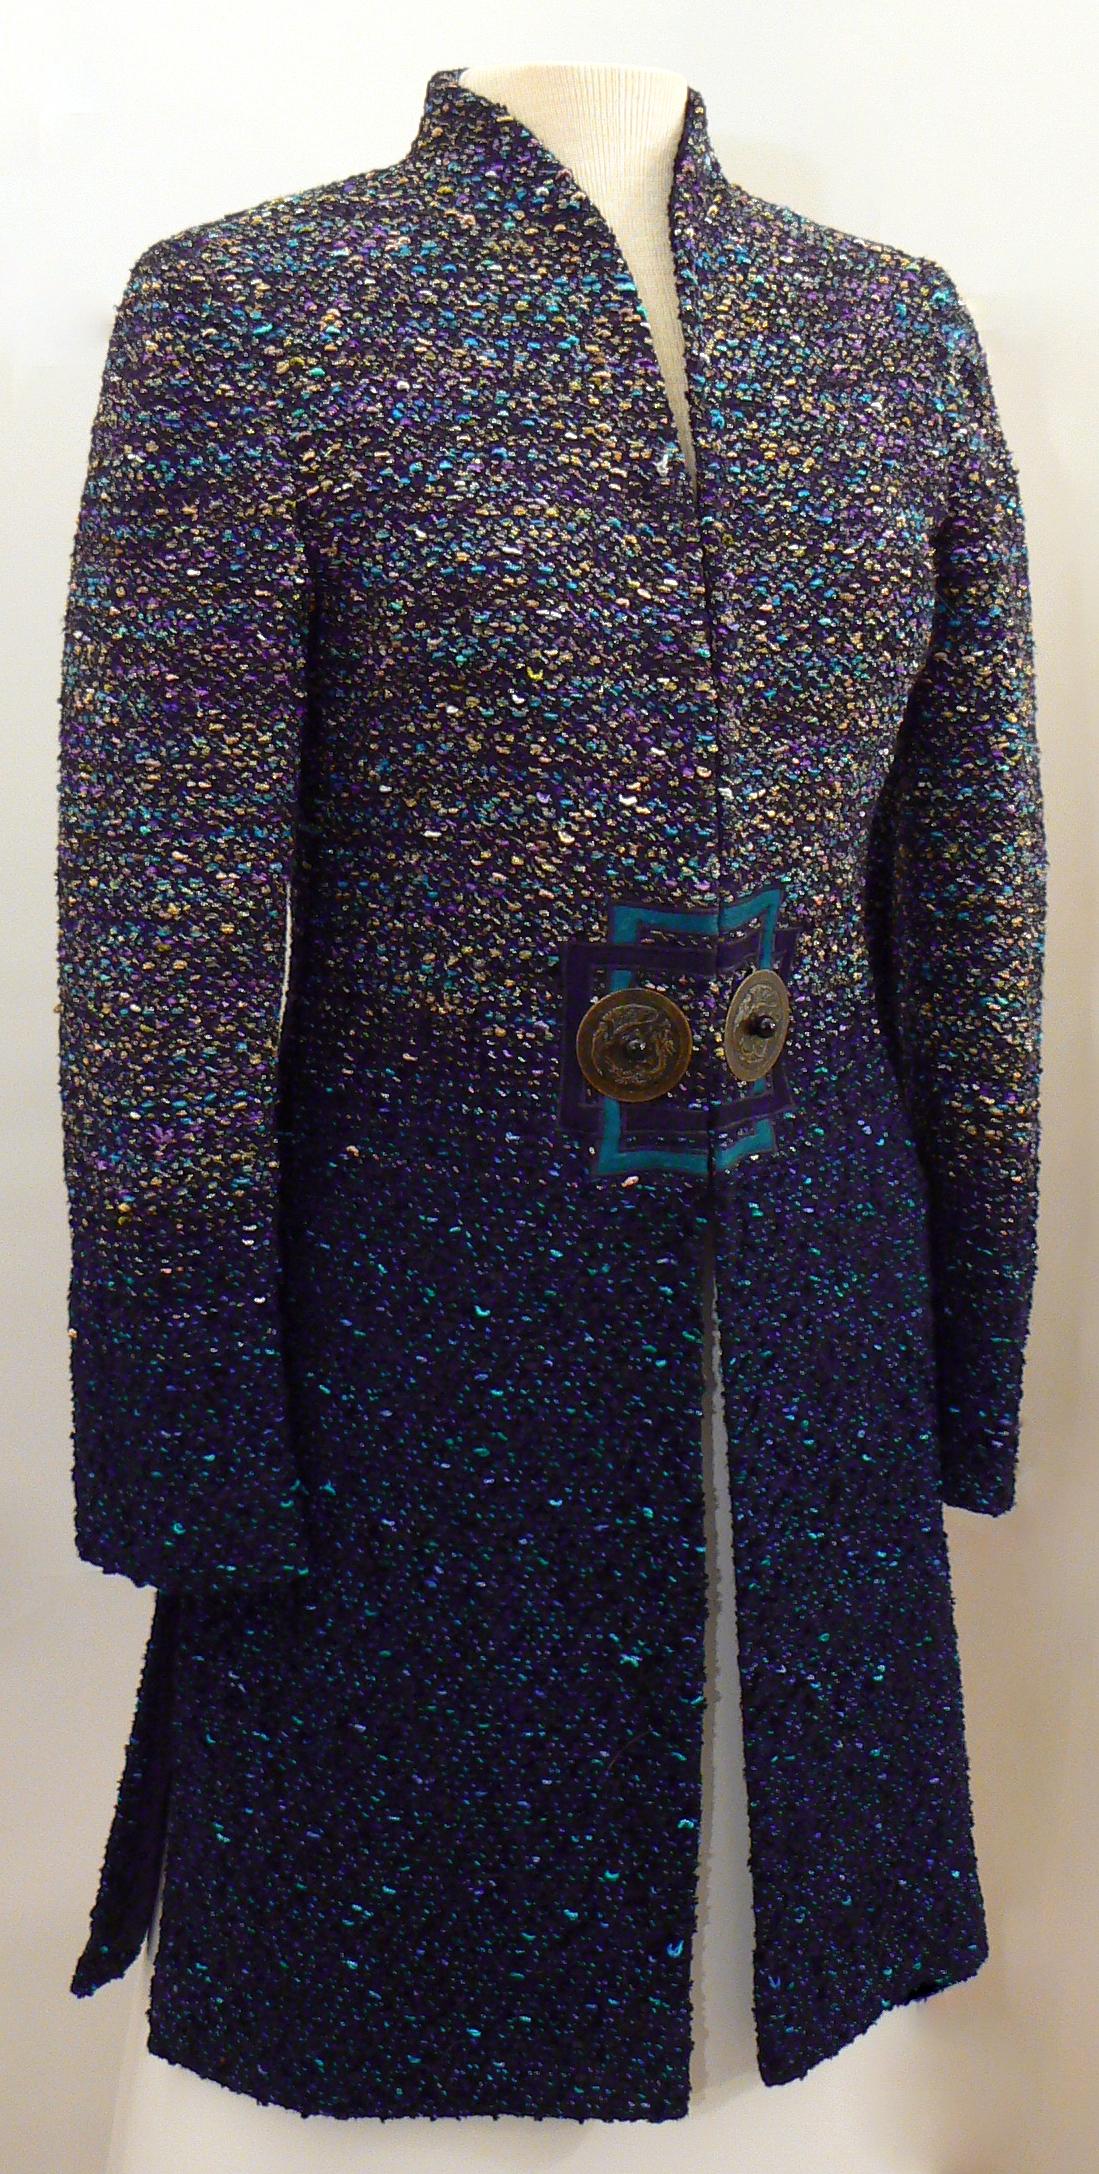 Handwoven Clothing, Coats, Kathleen Weir-West, 12-001.JPG